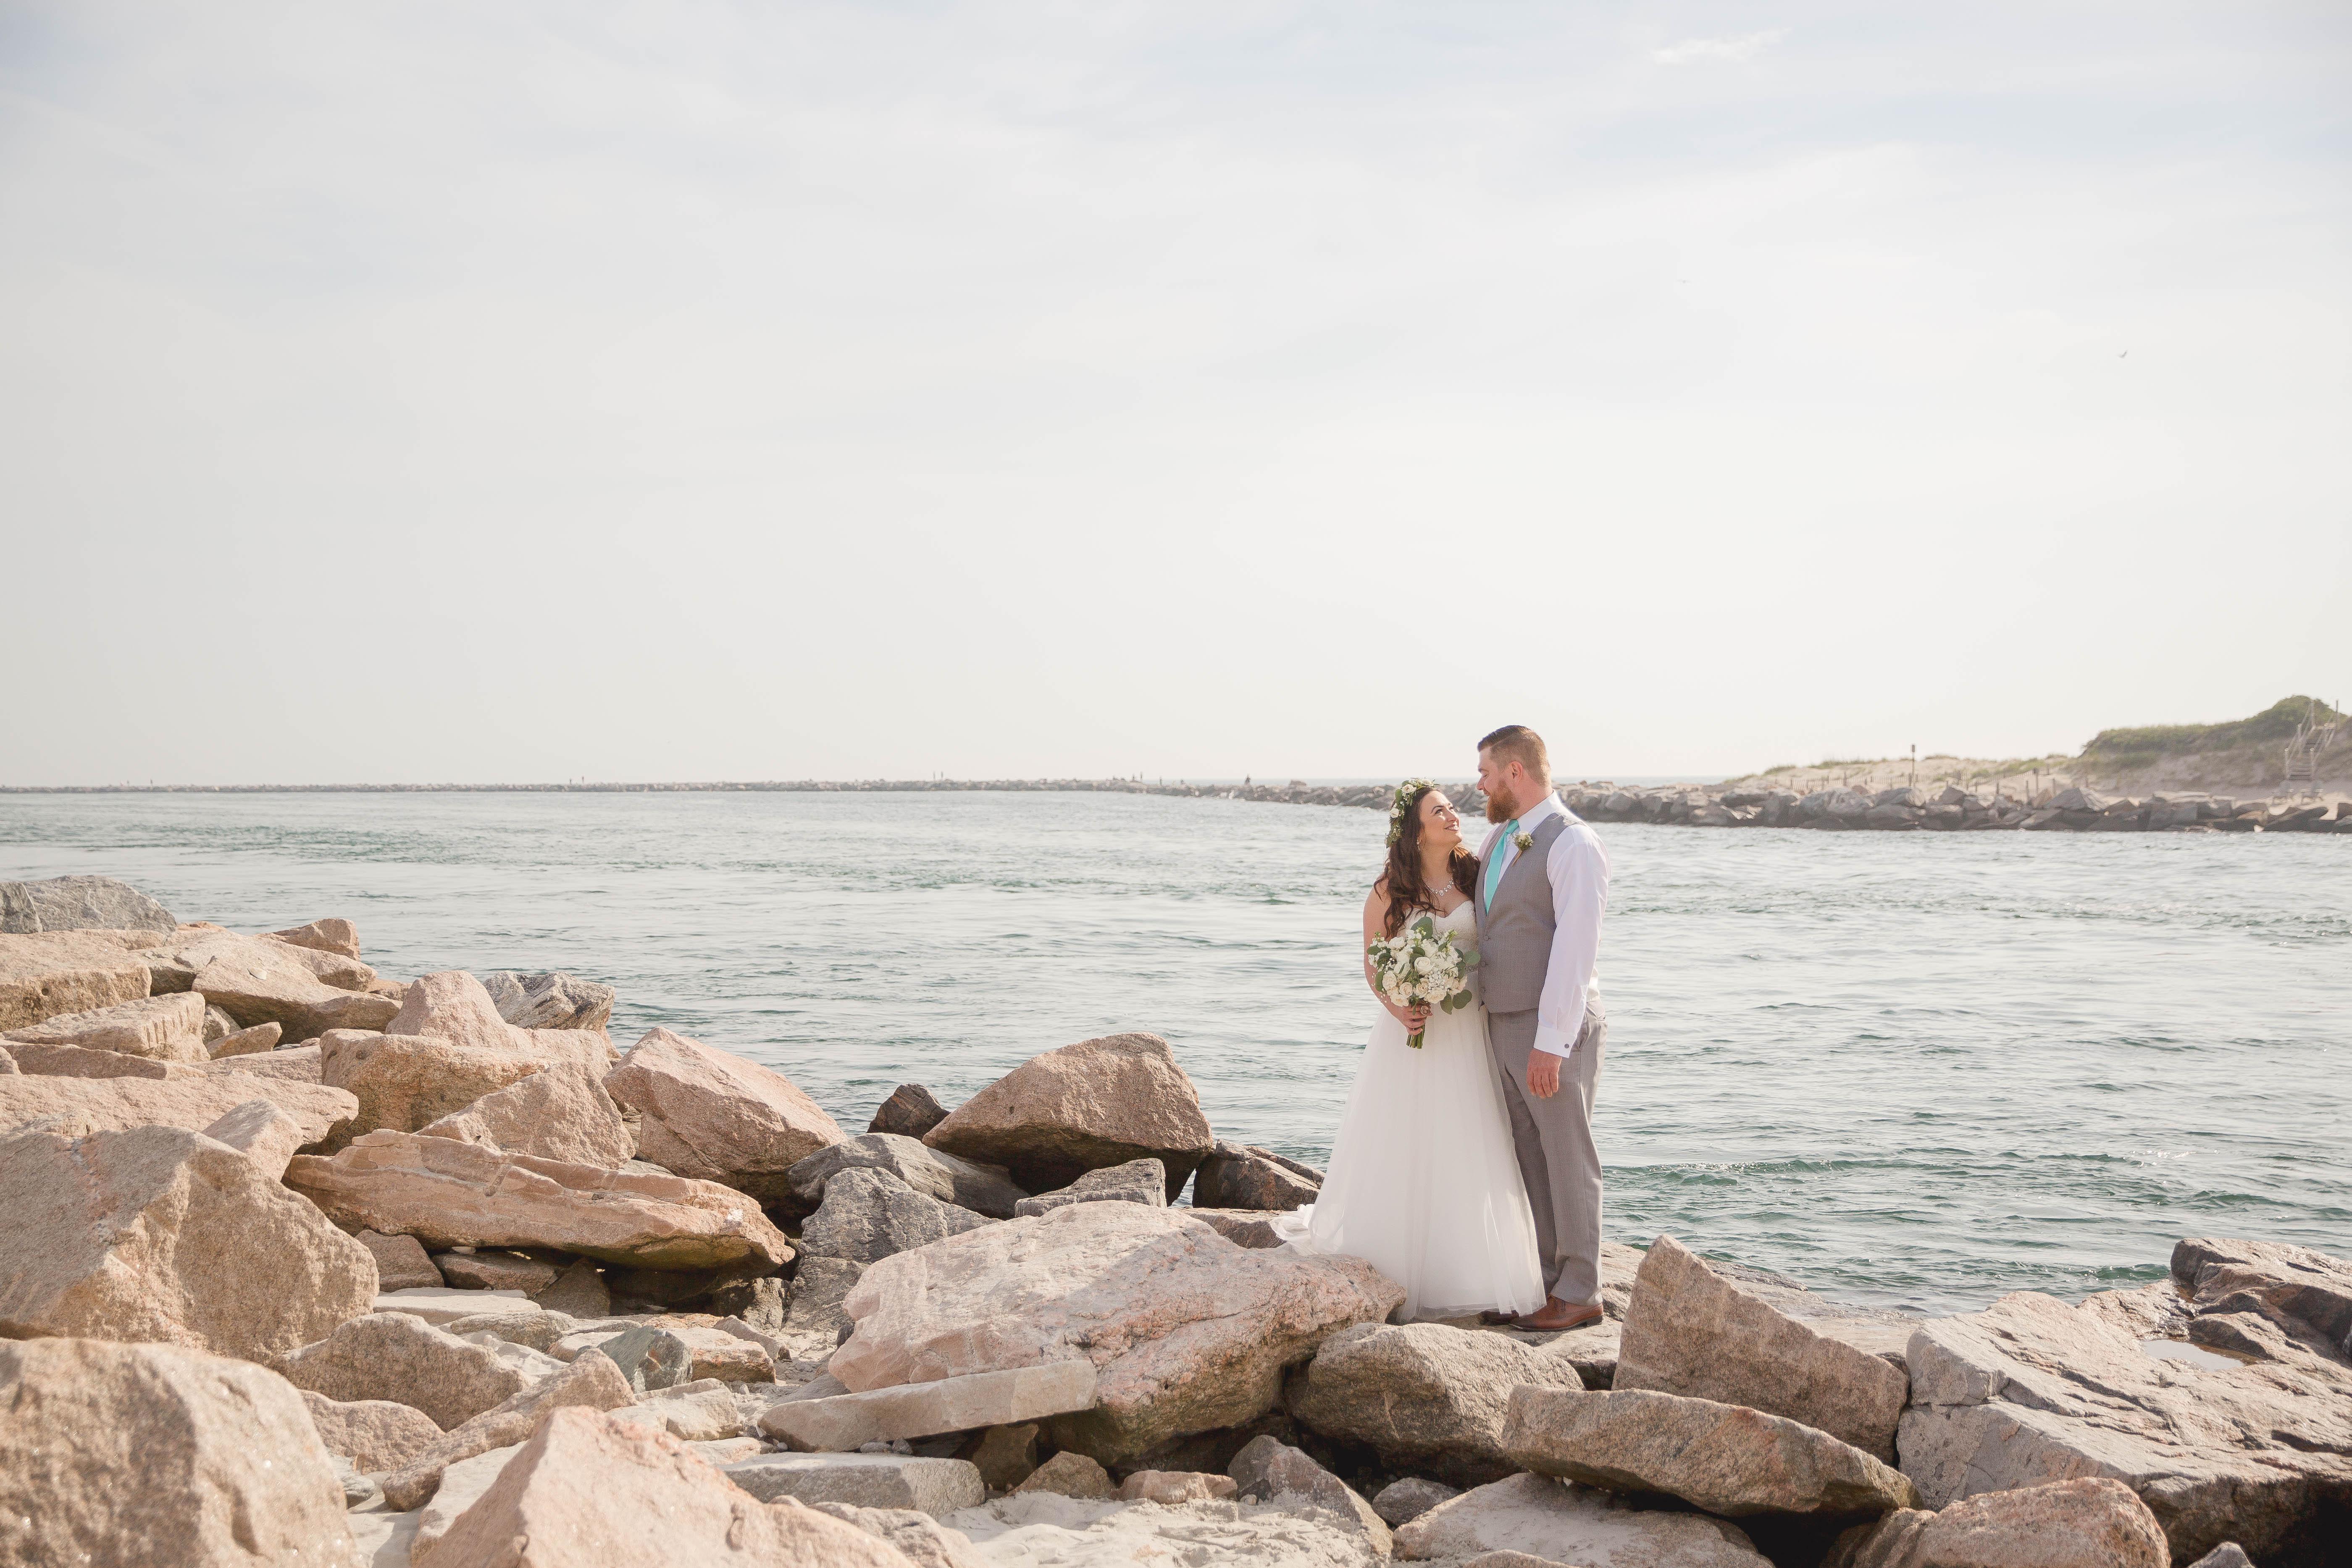 wedding, Rhode Island, beach, photography, couple, love, wedding photography, narragansett, Point judith,